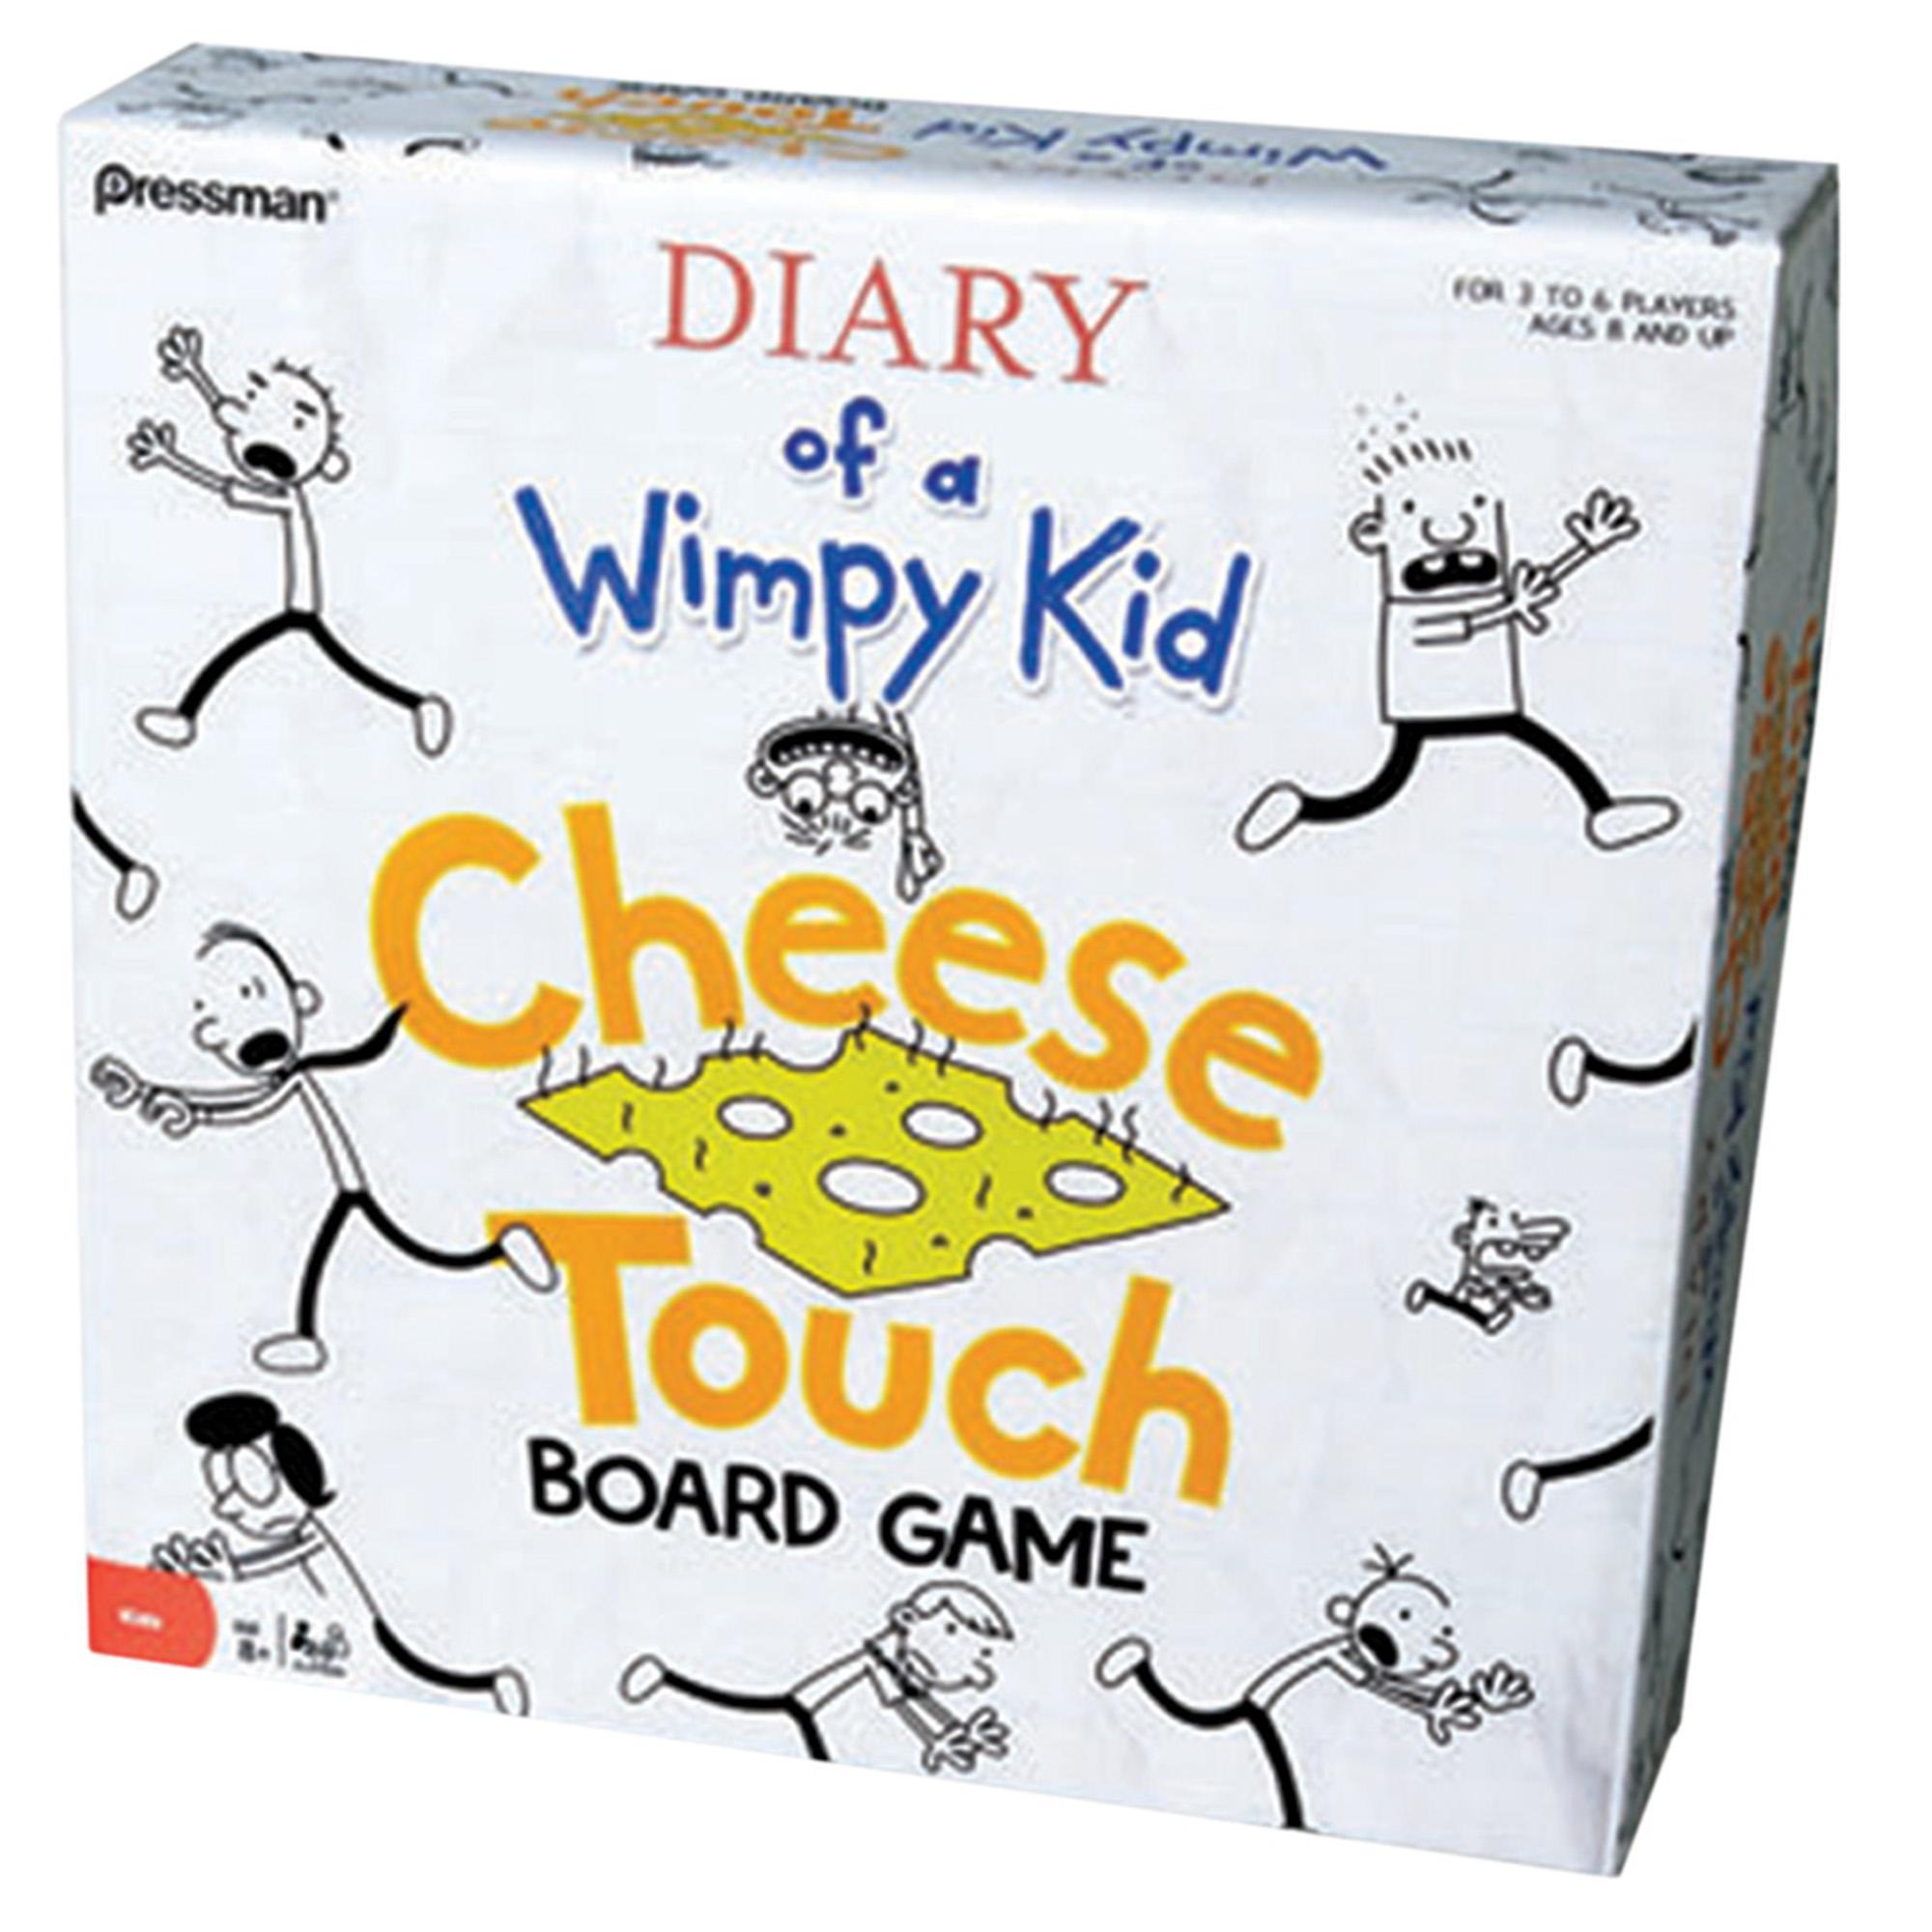 Drawn cheese diary wimpy kid #6